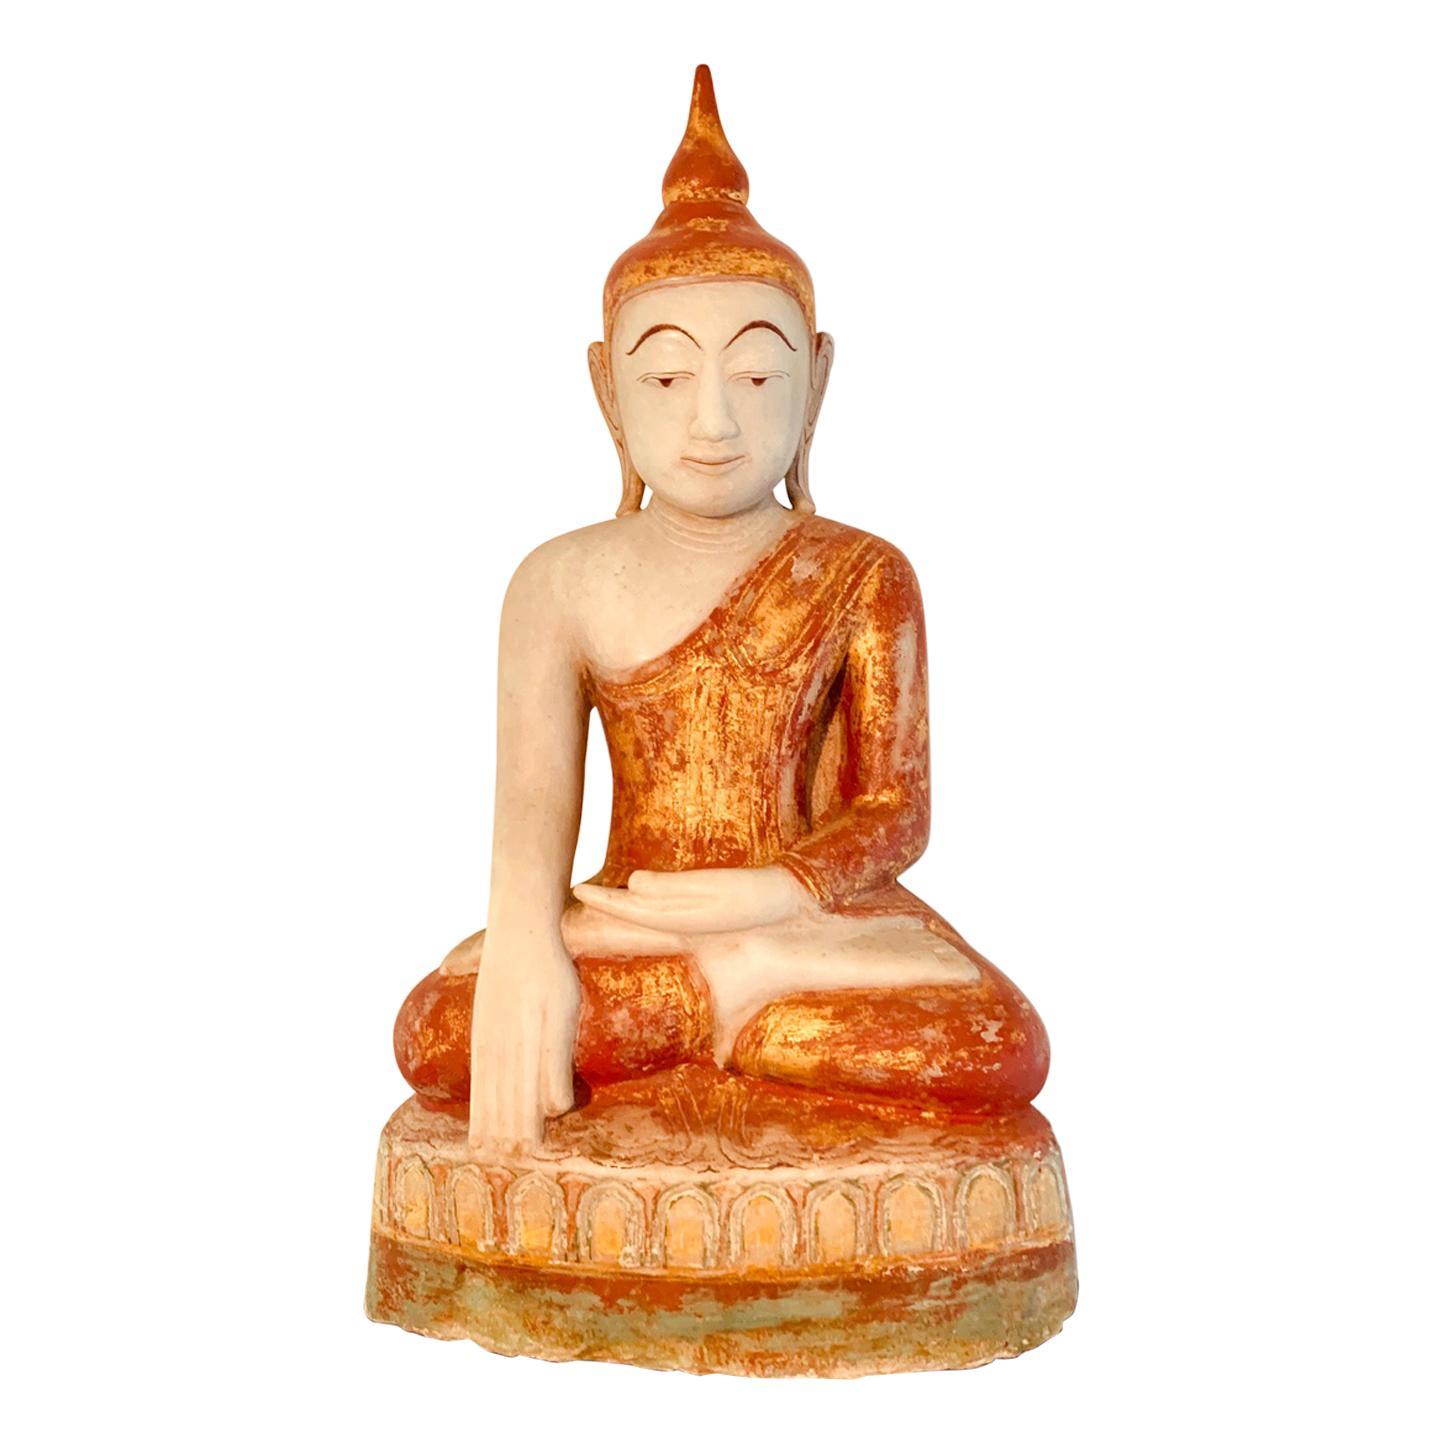 Antique Burmese Marble Buddha Statue